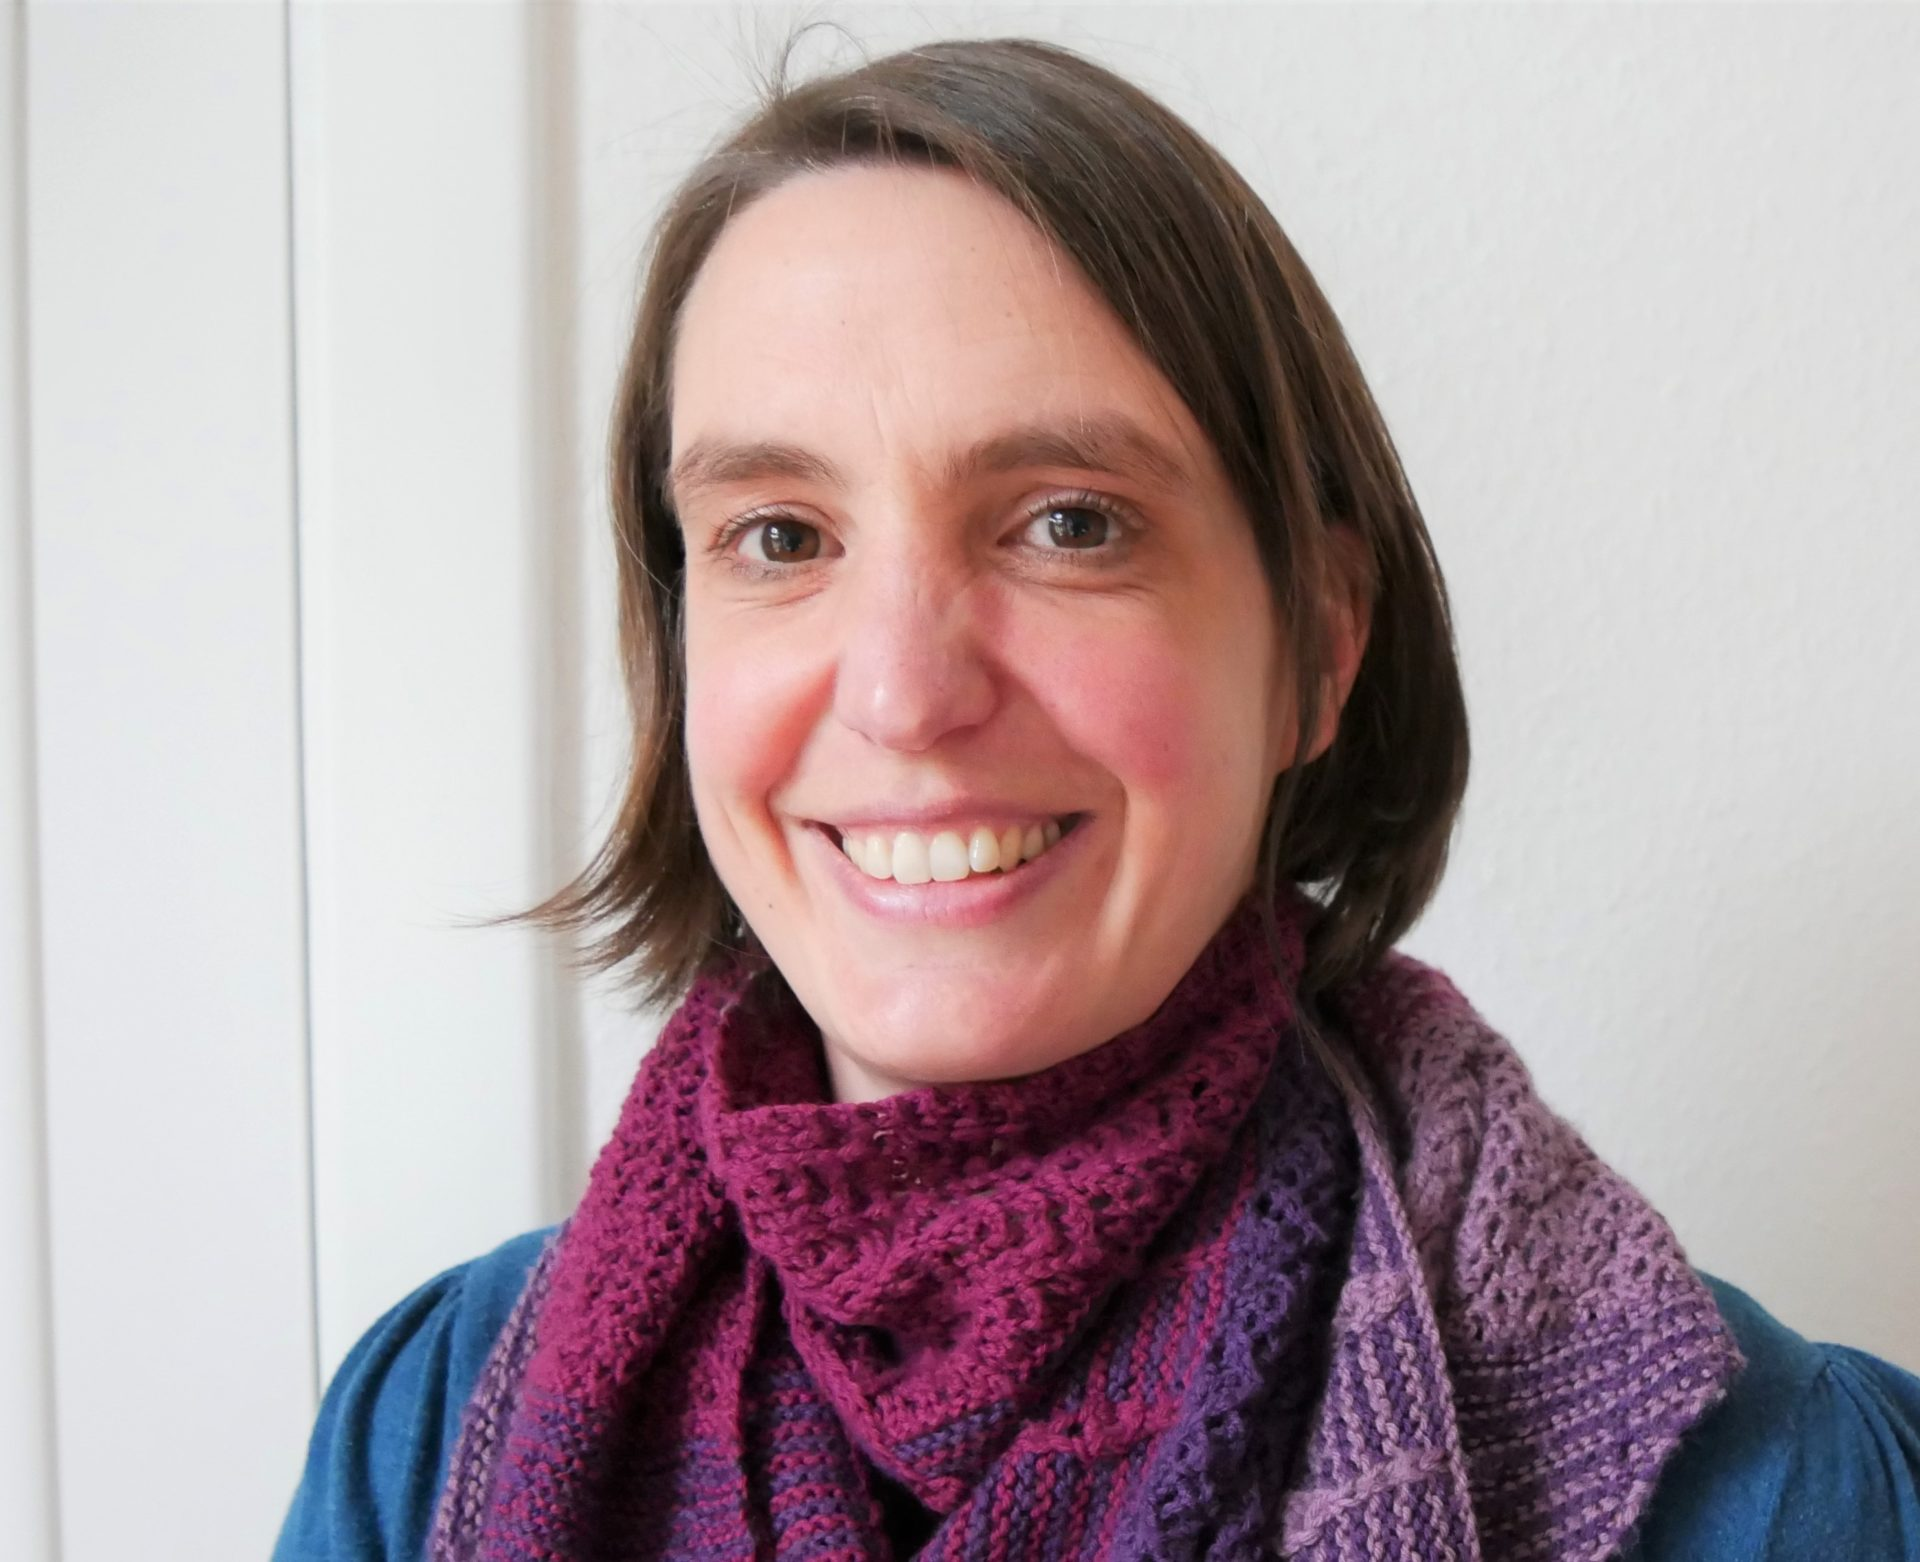 Ulrike Verwold